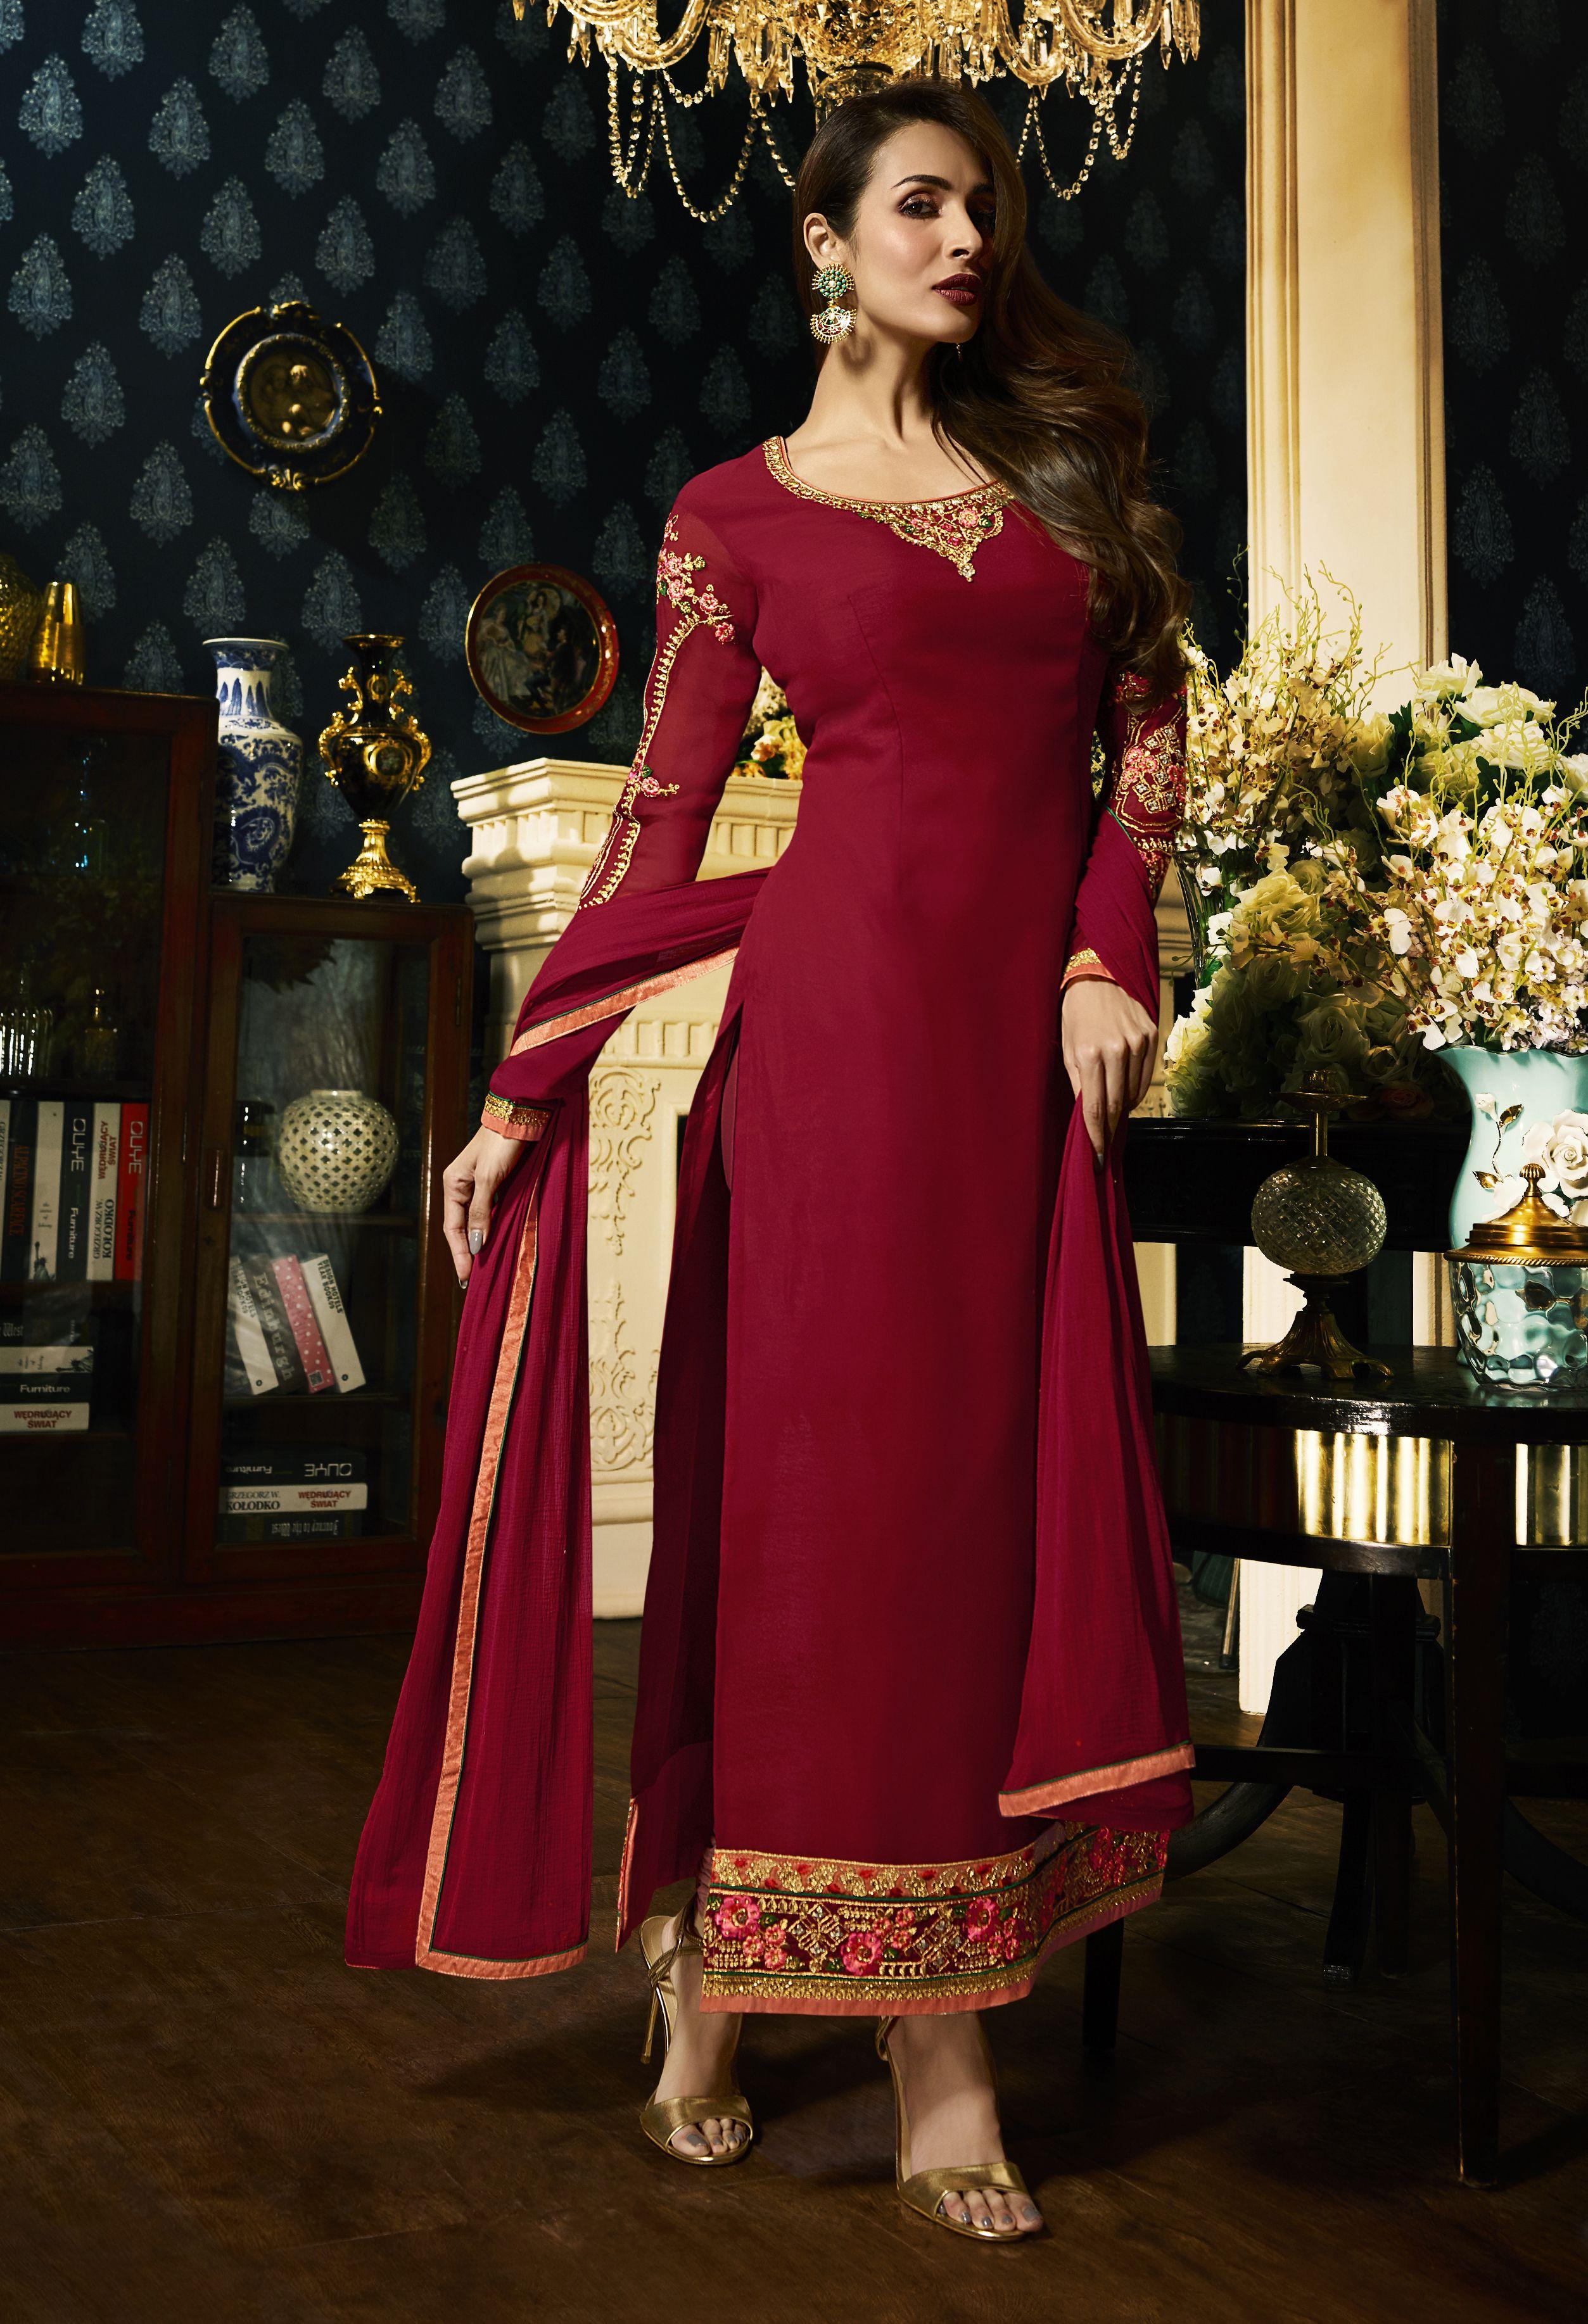 cad87233d8 Malaika Arora Red Embroidered Designer Salwar Suit Look stunningly  beautiful in this Malaika Arora Khan red faux georgette floor length salwar  suit.